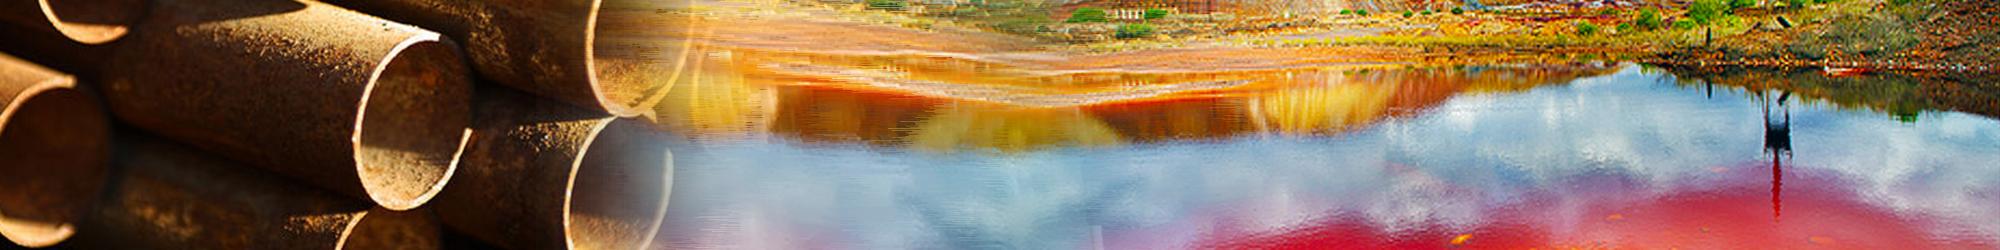 slim-banner-dam-1